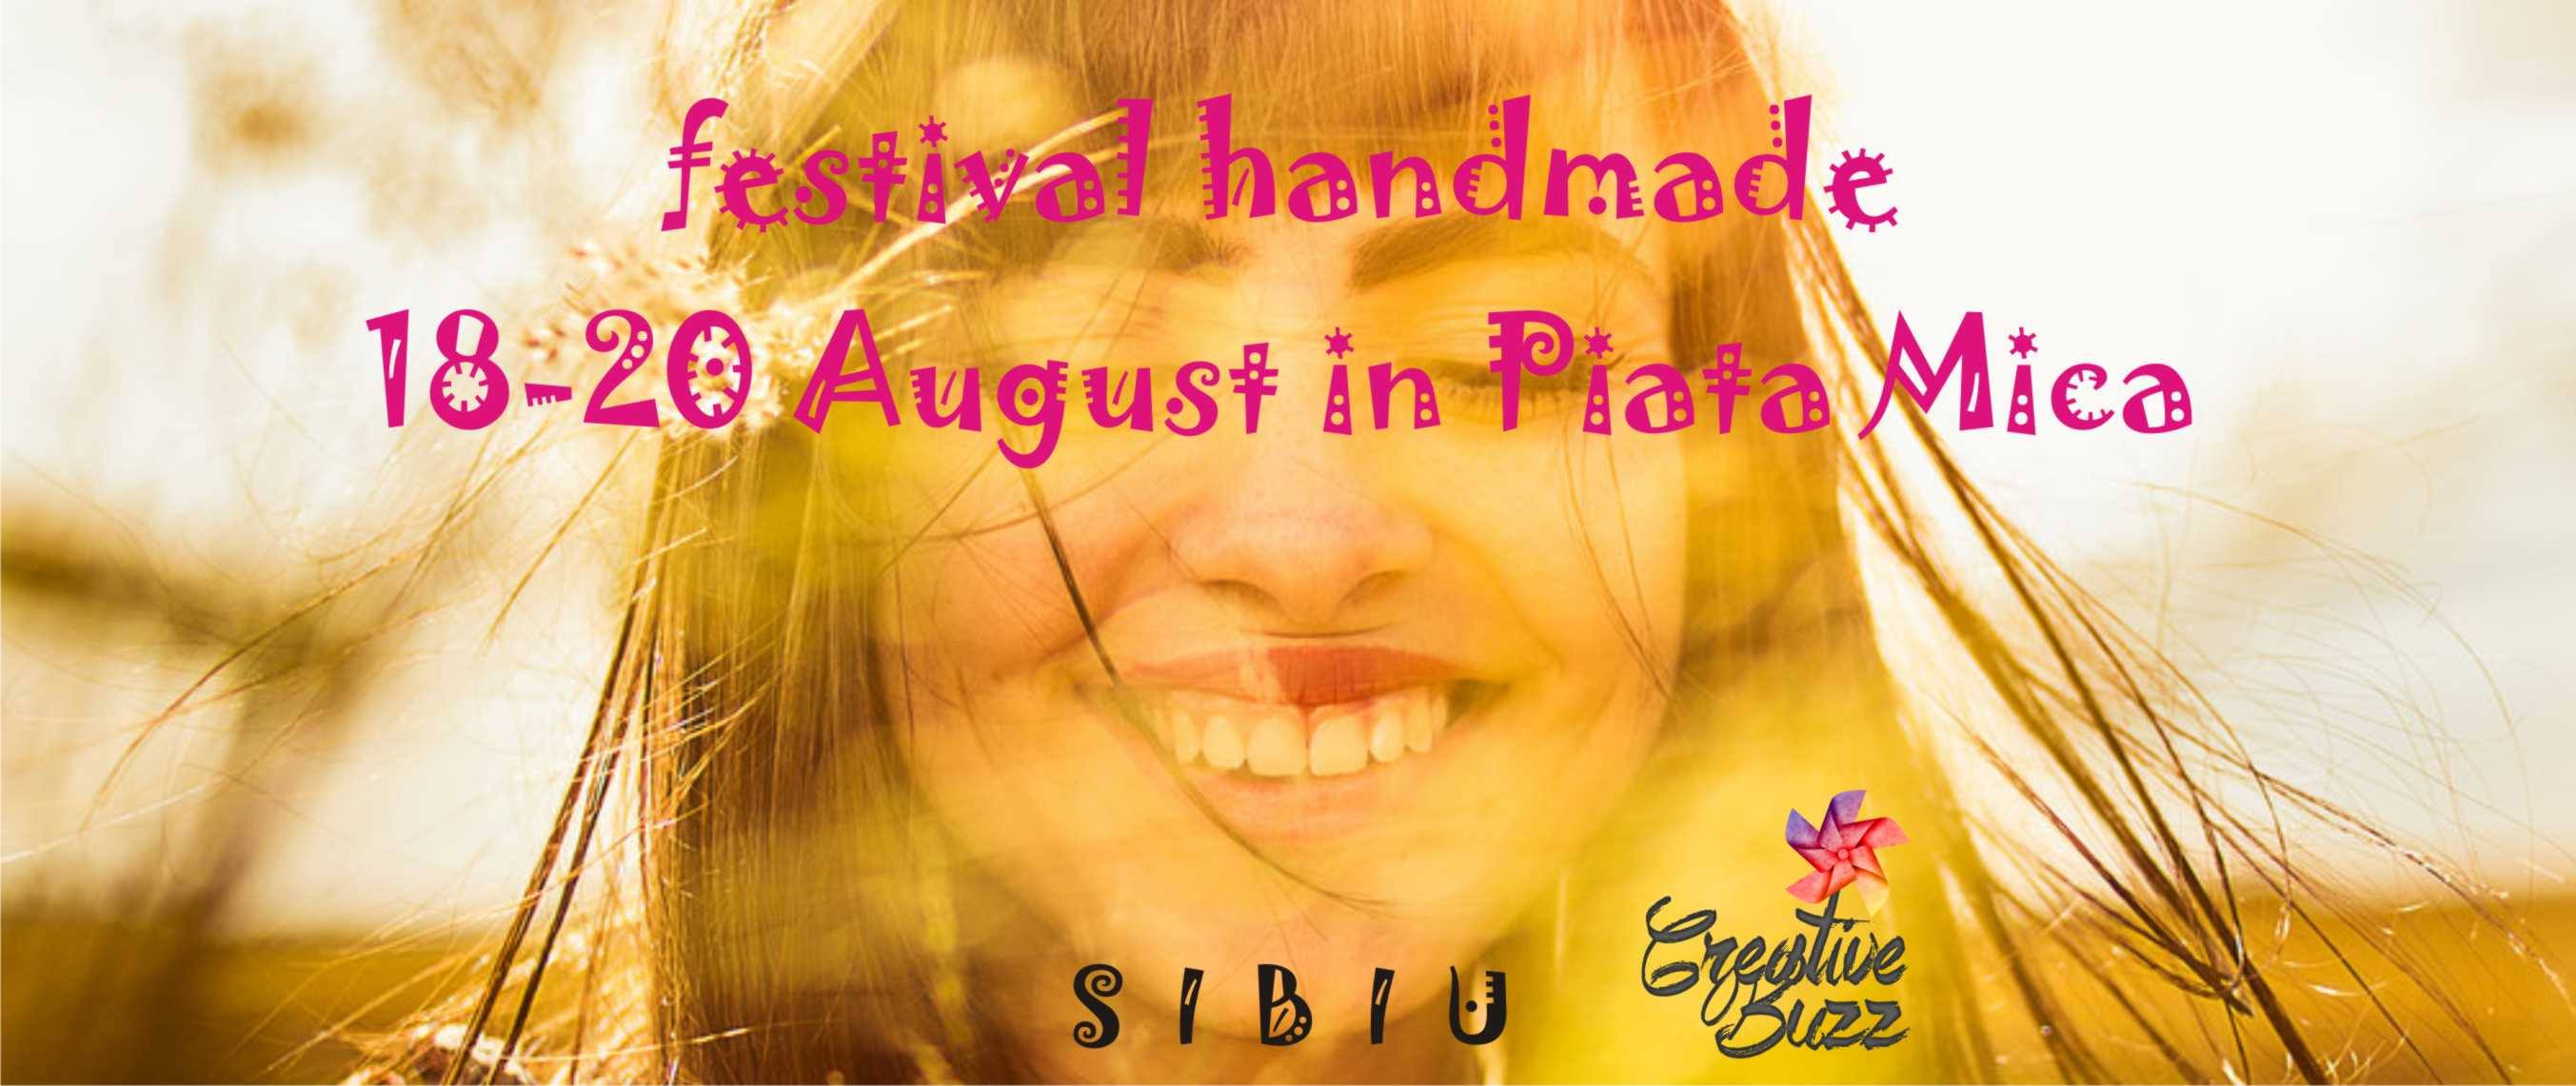 Festival Handmade Creative Buzz la Sibiu - ediția 13